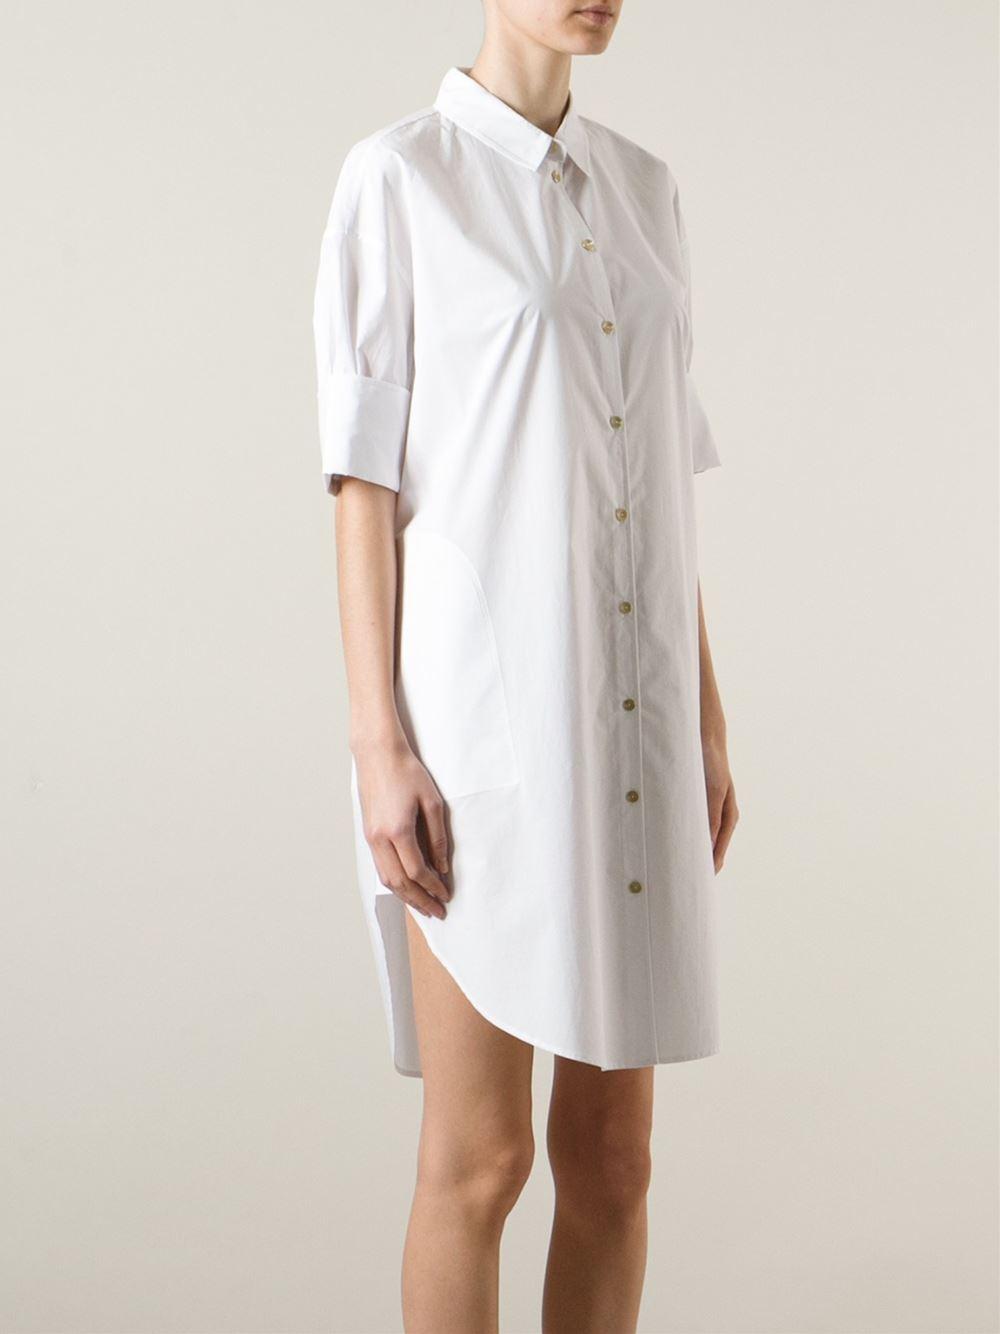 acne studios 39 lash 39 shirt dress in white lyst